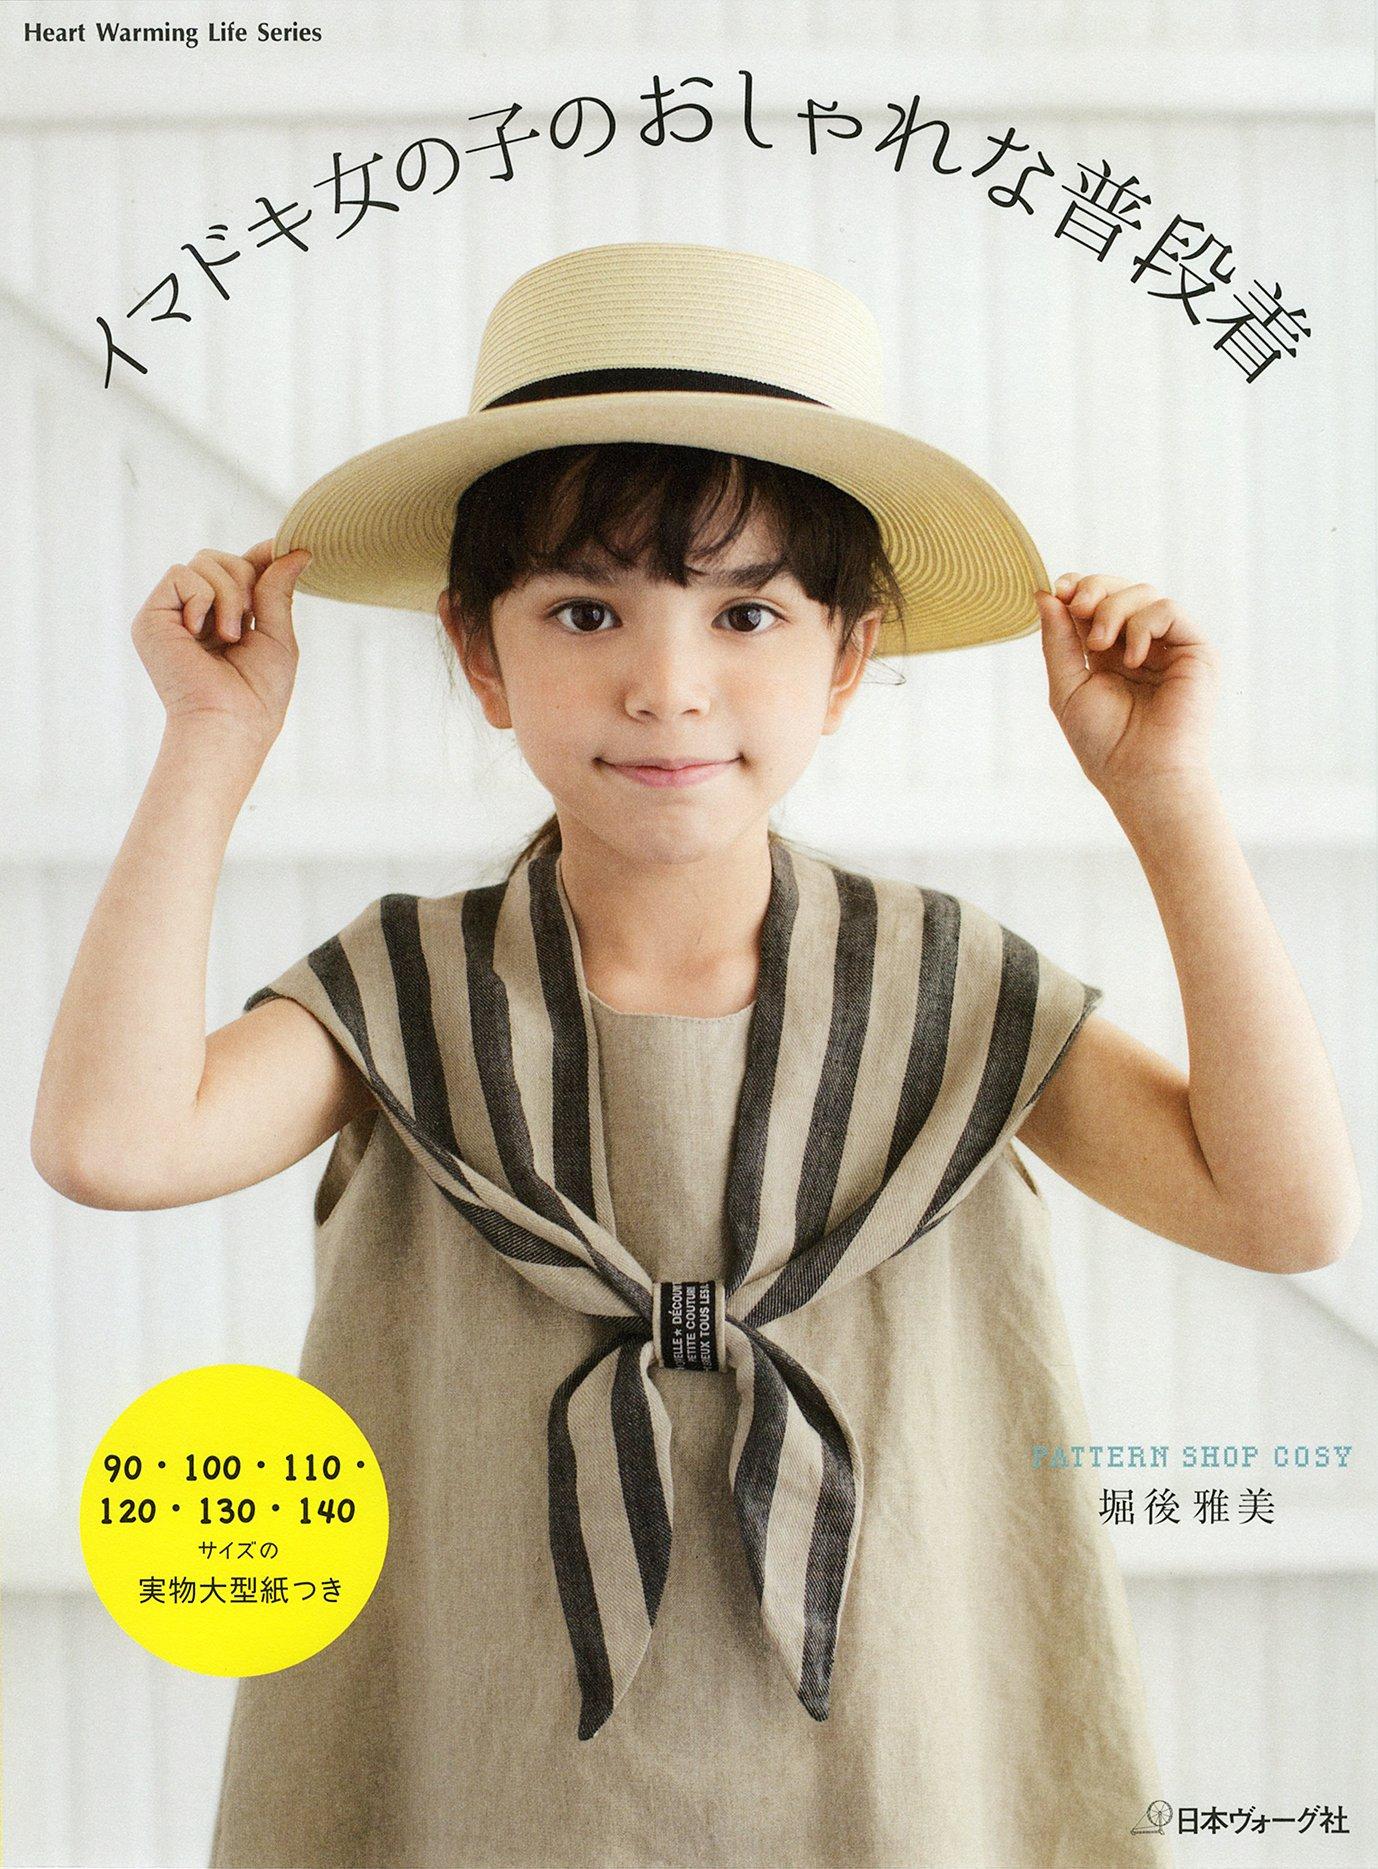 Imadoki girls fashionable casual clothes